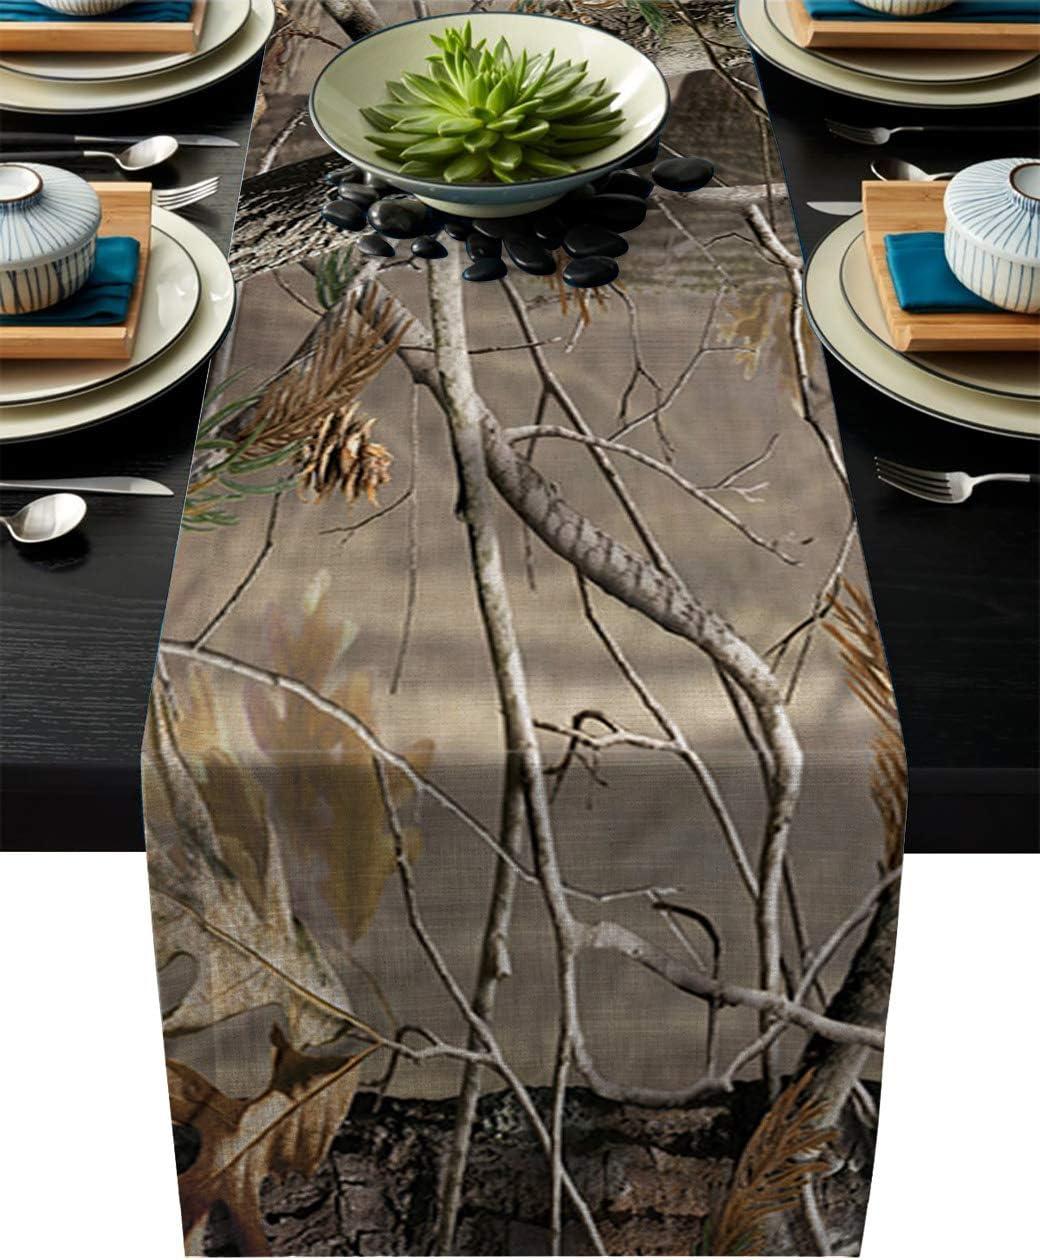 Cotton Linen Table Runner Dresser Scarves Camouflage Tree Non-Slip Burlap Rectangle Dinner Runners for Outdoor Indoor Parties Wedding Home Decor - 13